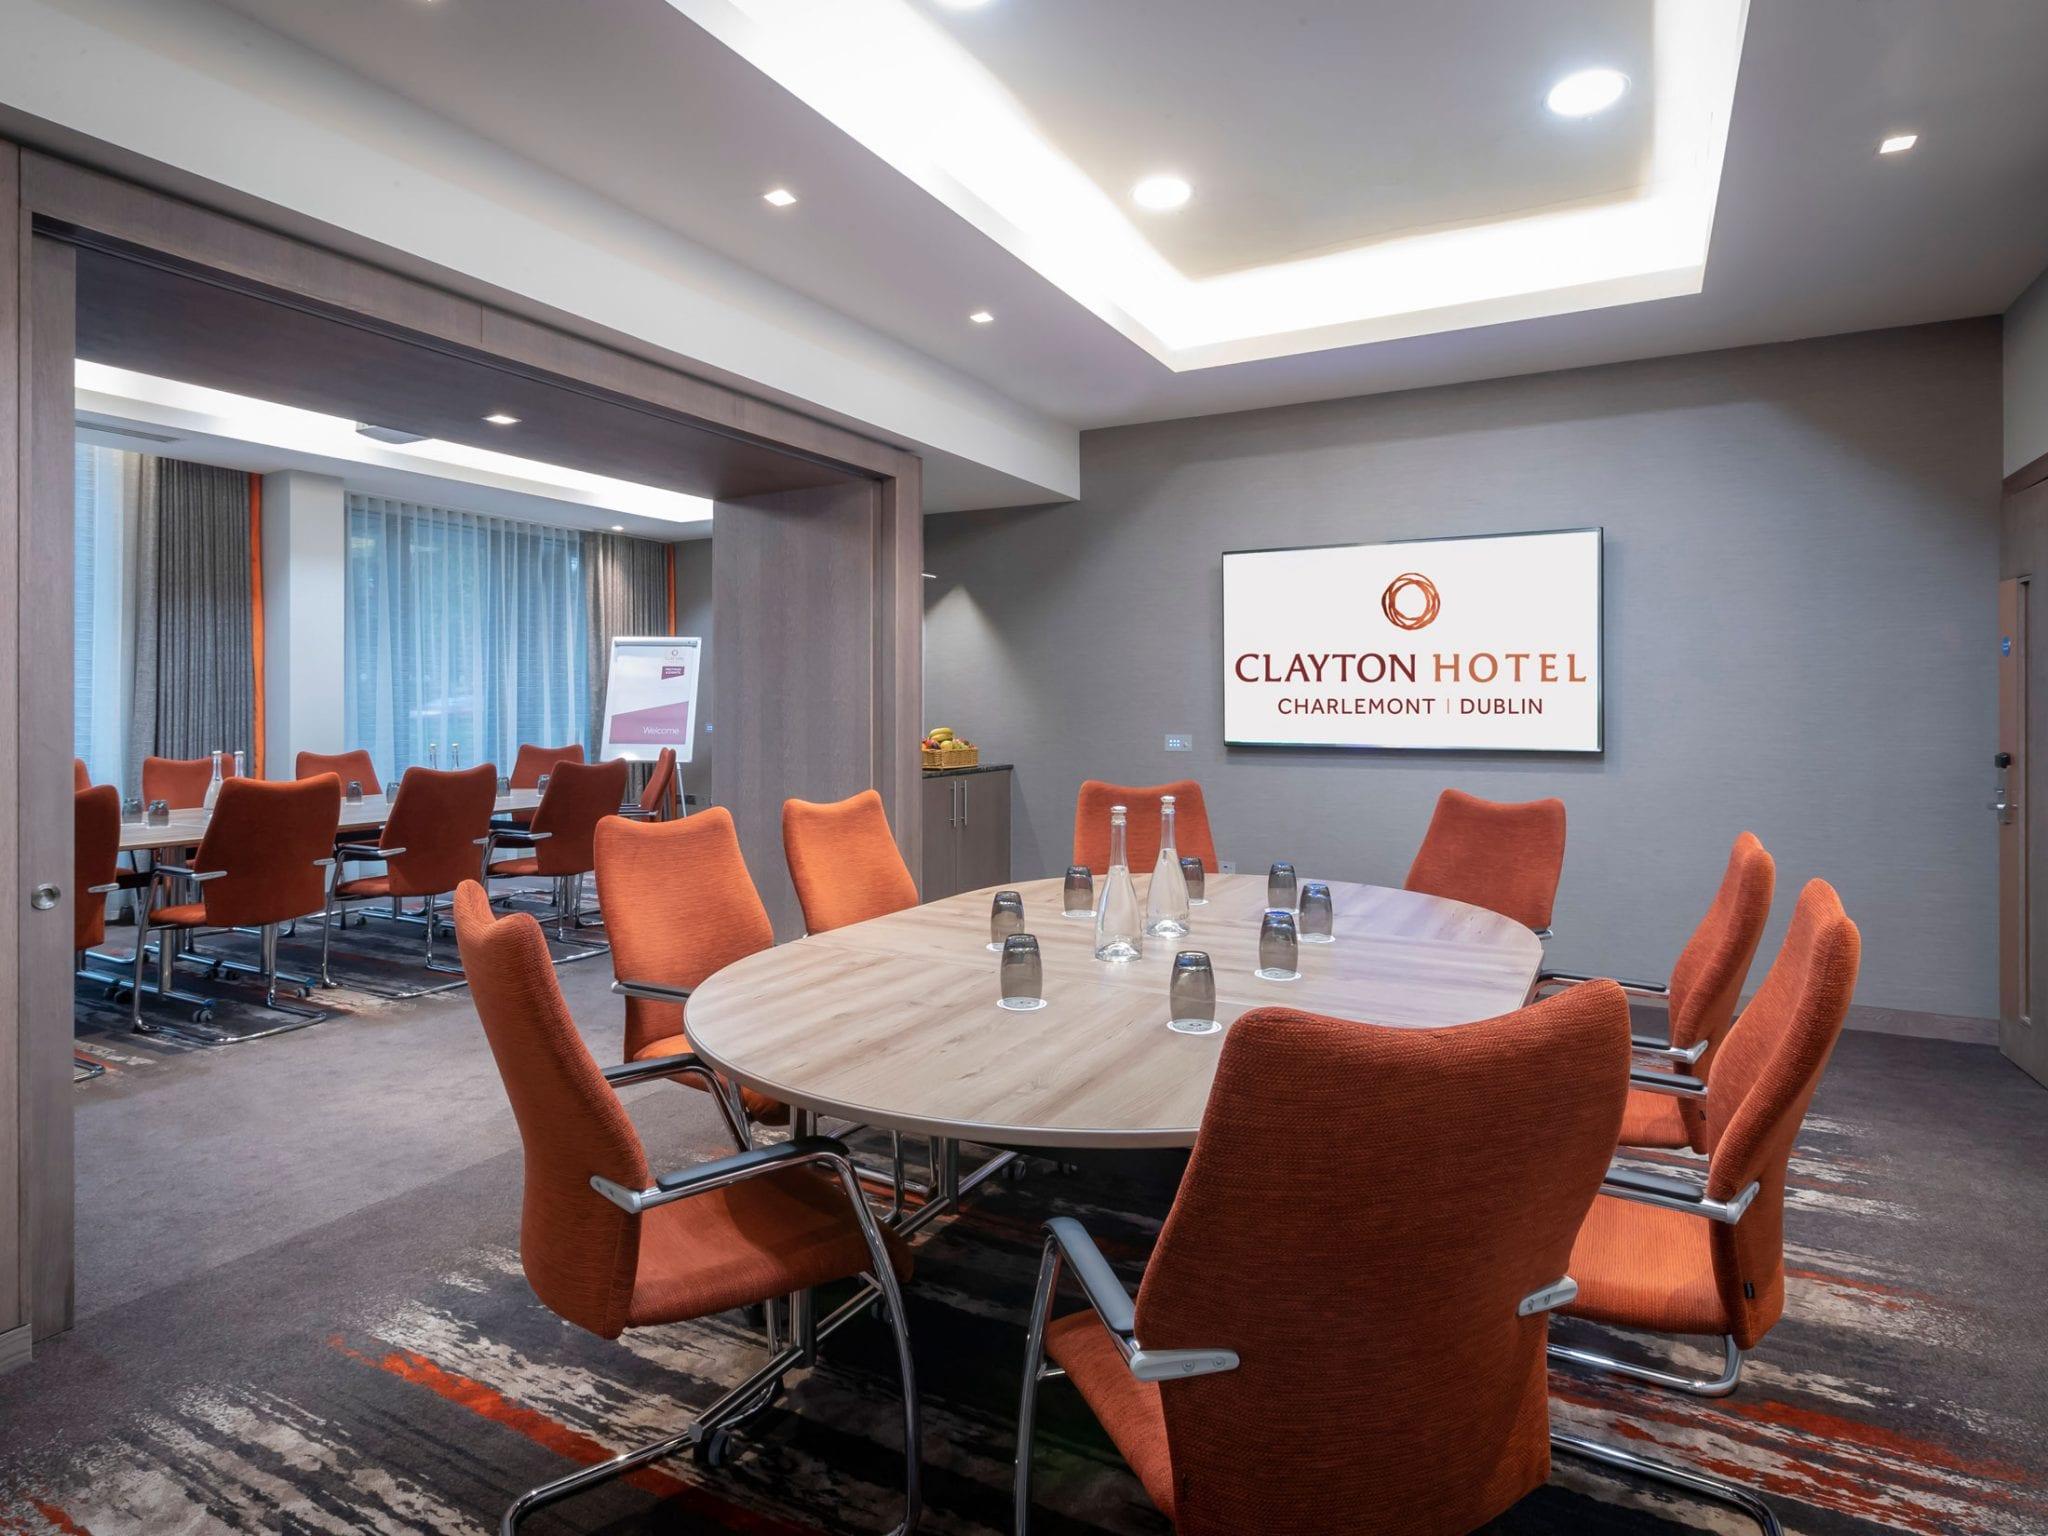 Portobello meeting room at Clayton Hotel Charlemont